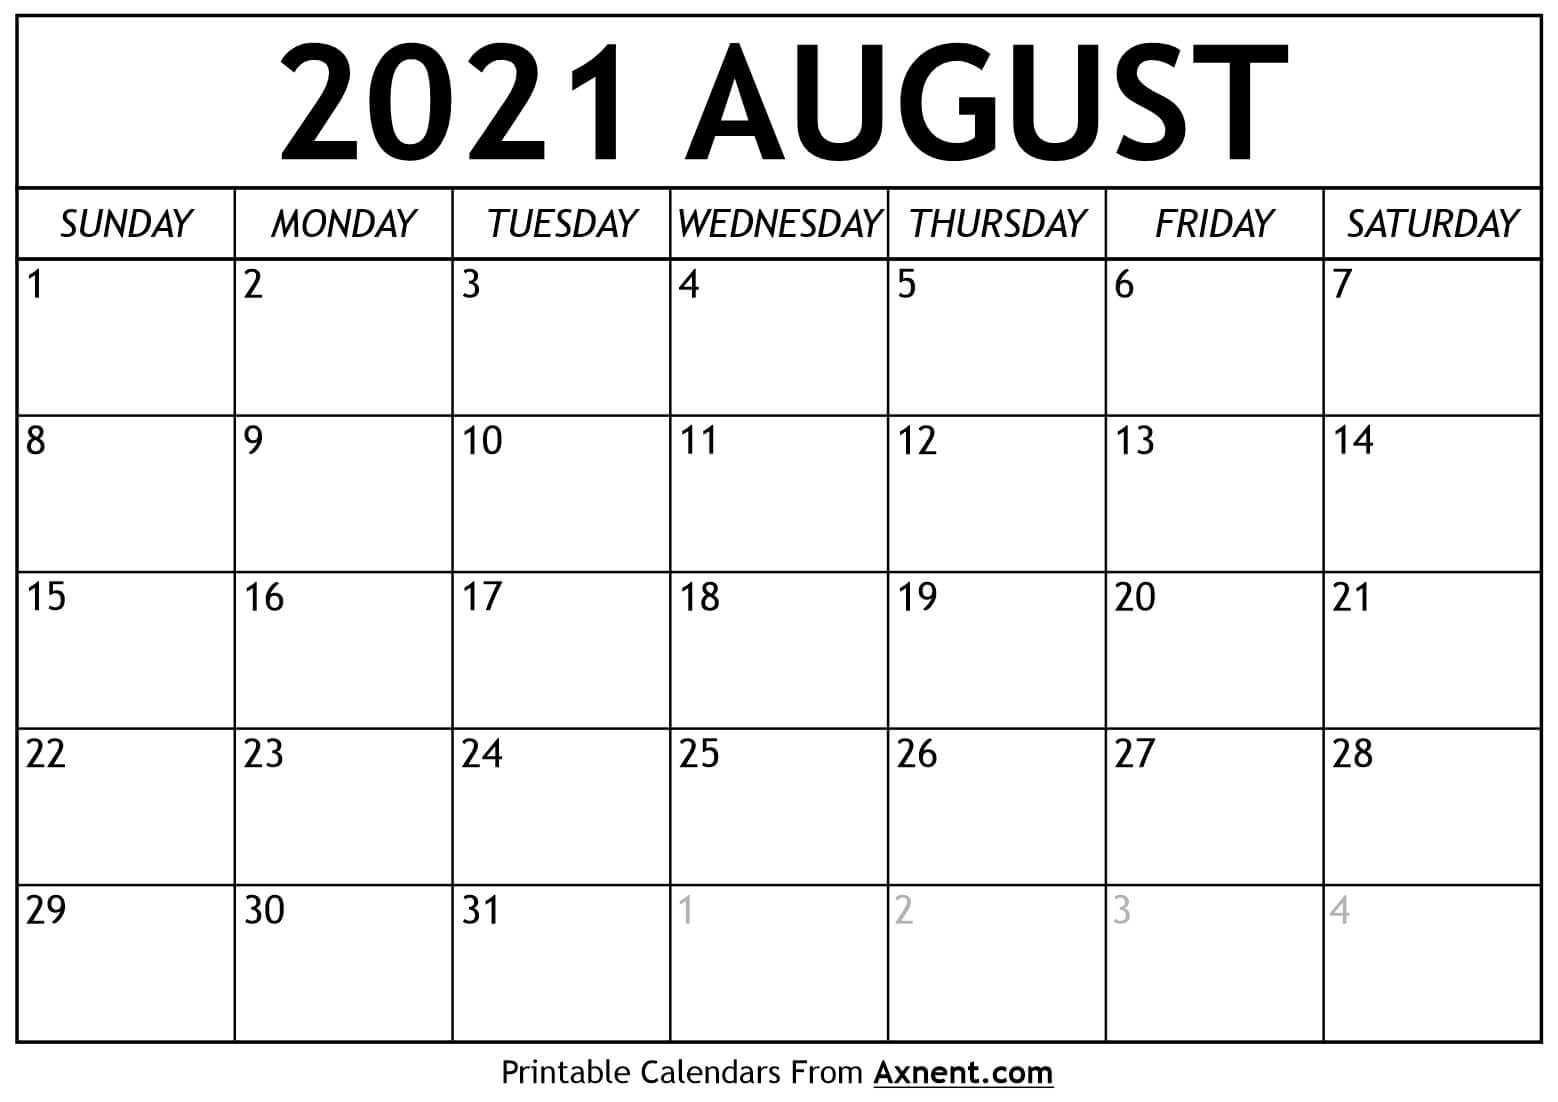 2021 Aug Printable Calendar